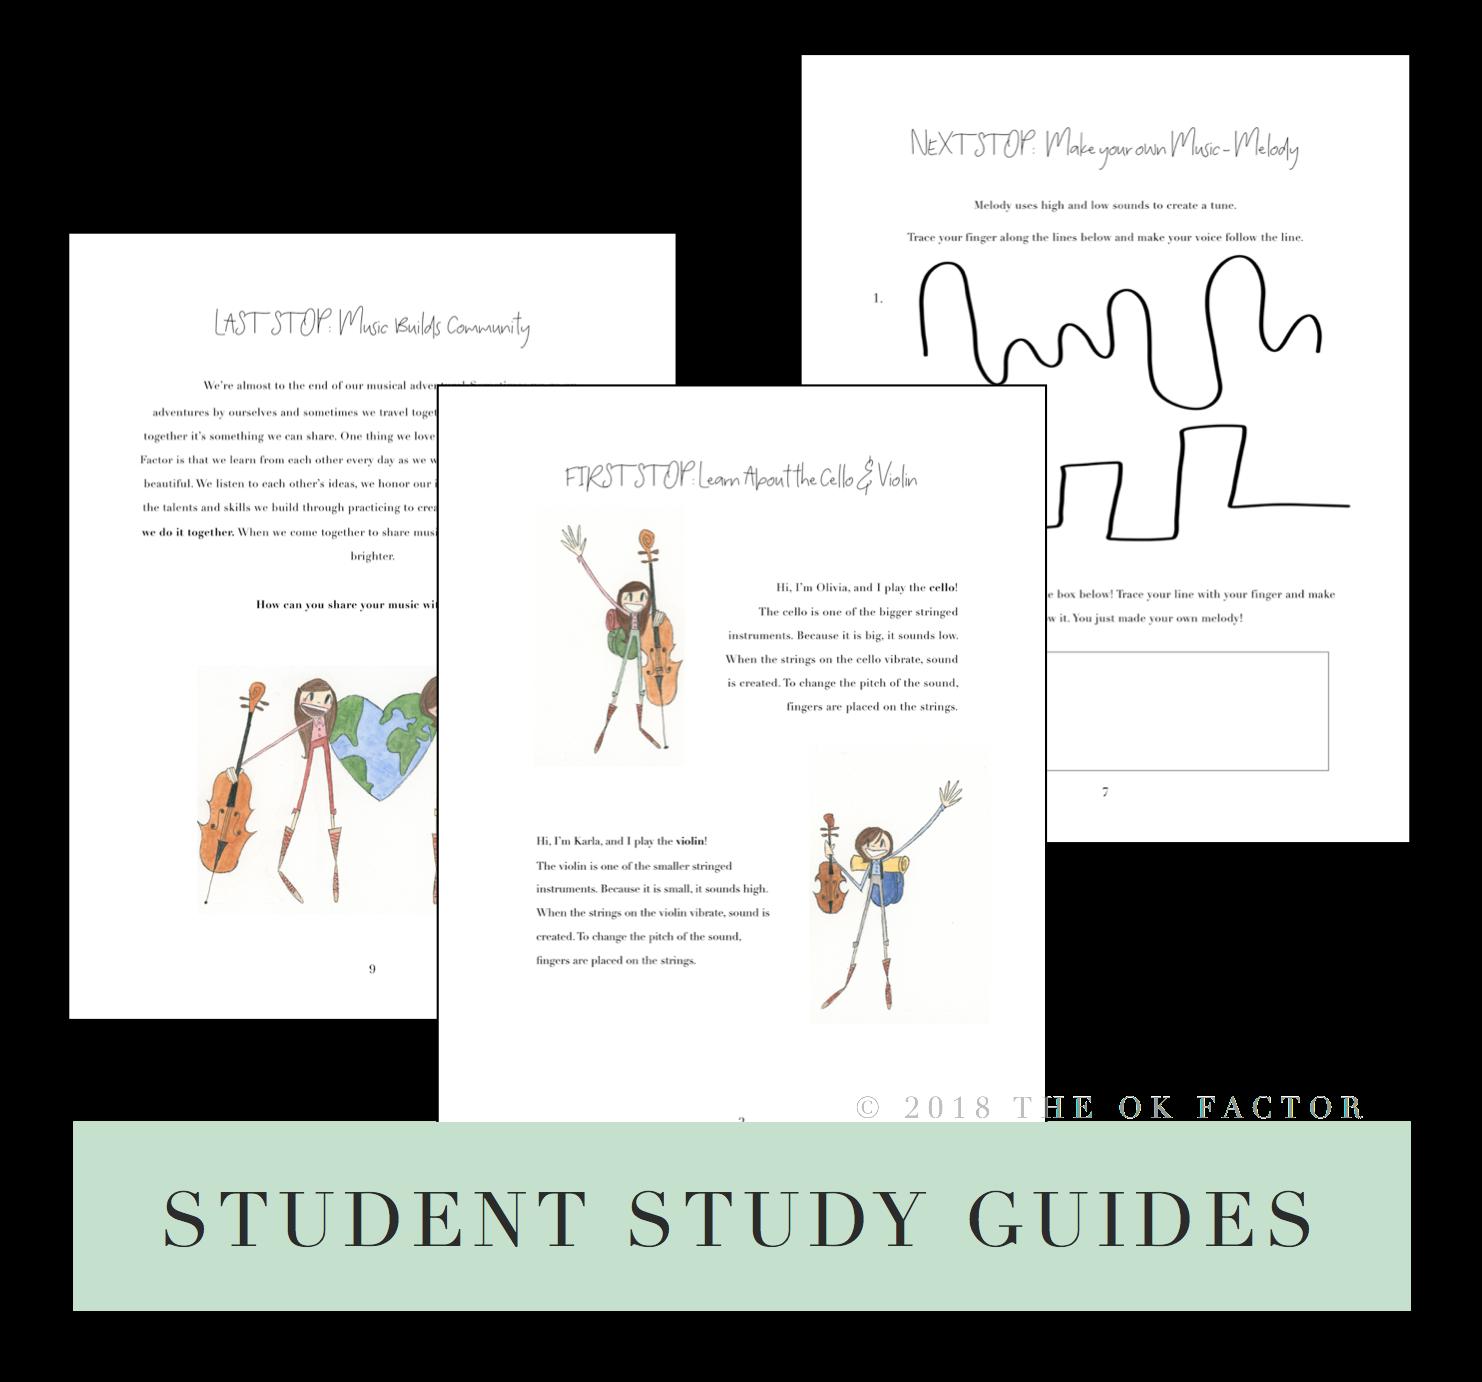 atlas sample study guides v.1.png